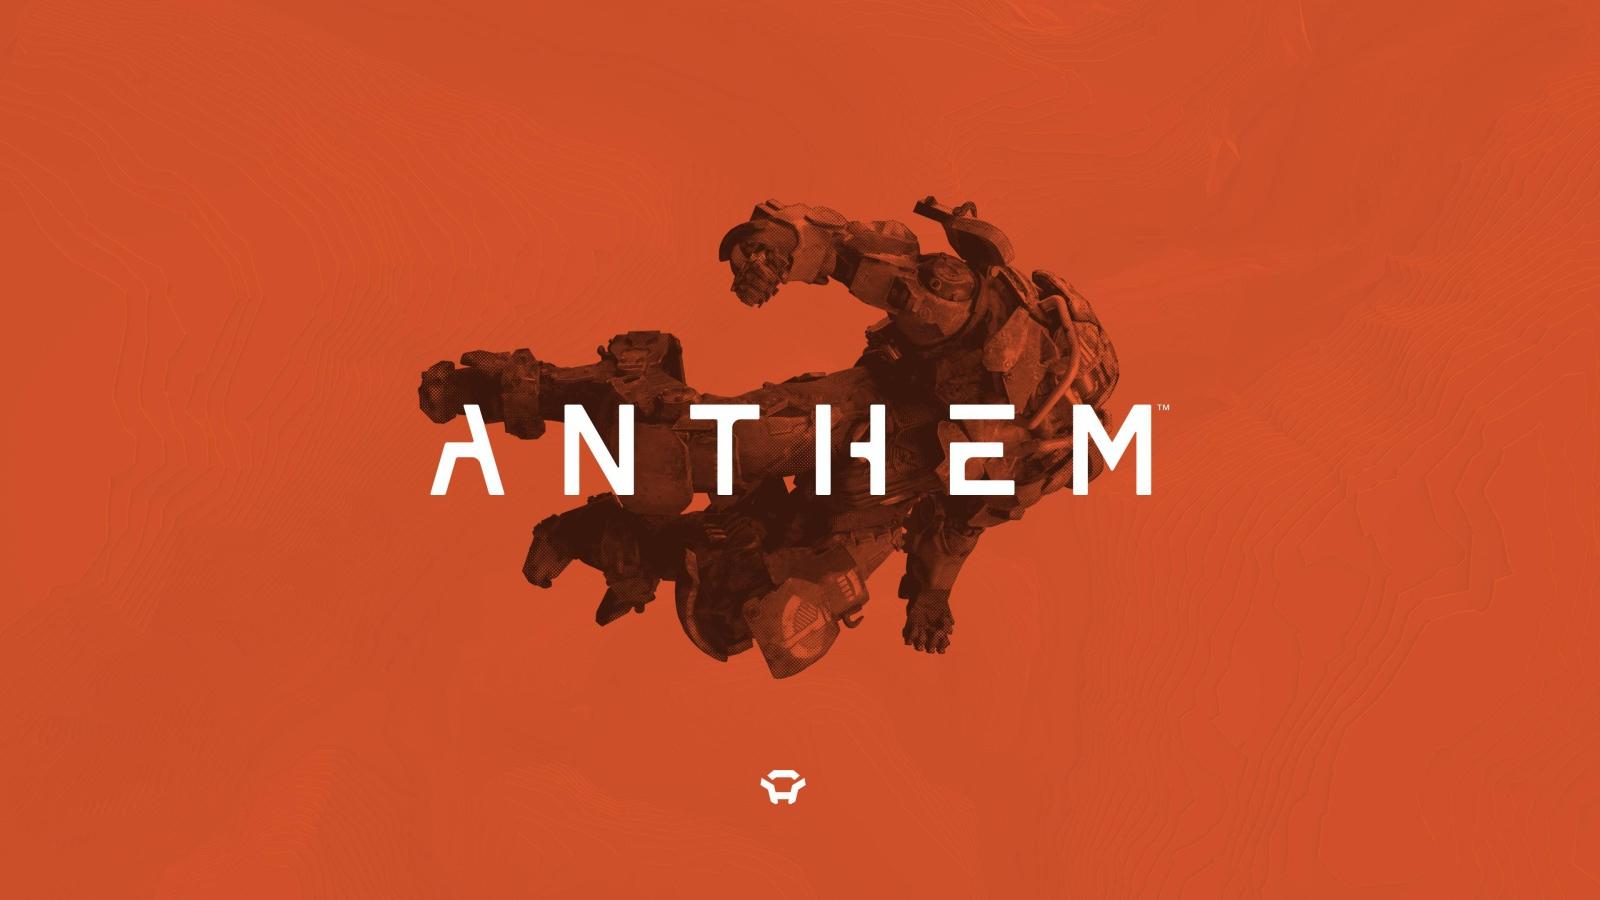 2019Games Logo computer game Anthem  2019 on an orange background 133734 25